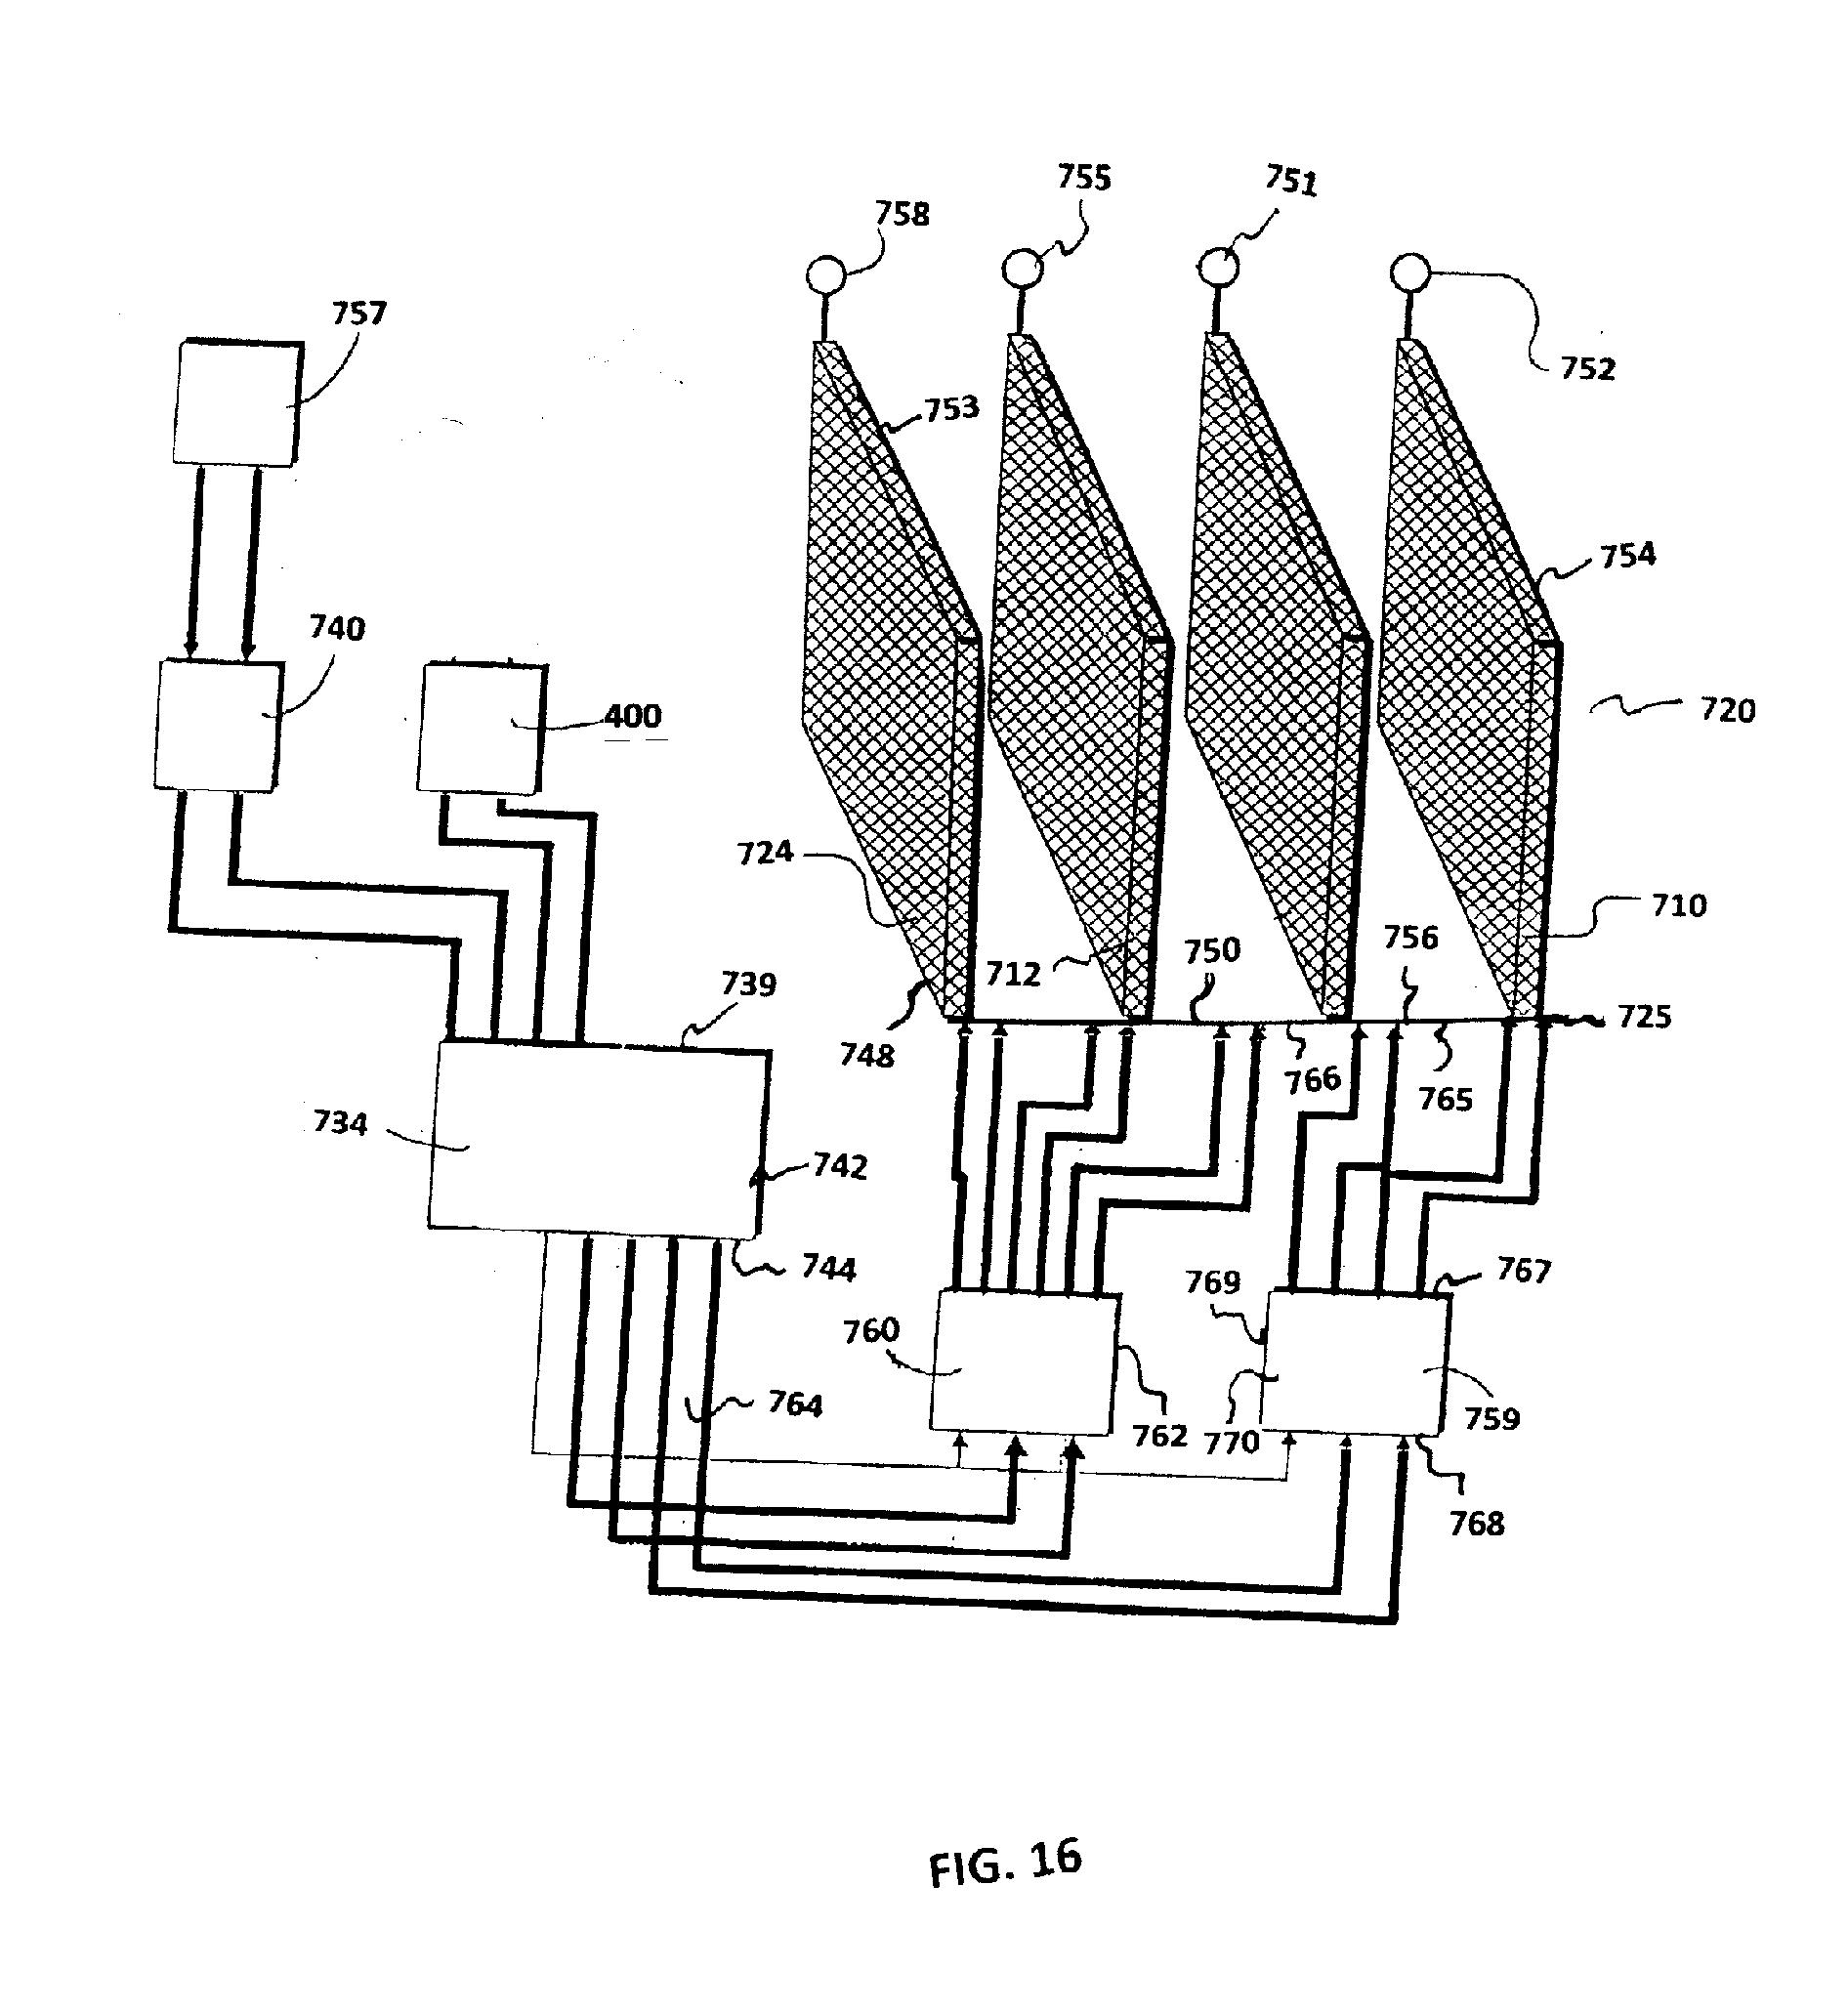 dvr 722 wiring diagram database Dish Network Diplexer Wiring-Diagram patent us20120032876 mega munication and media apparatus dish 722k dvr dvr 722 source dishtv connection diagram